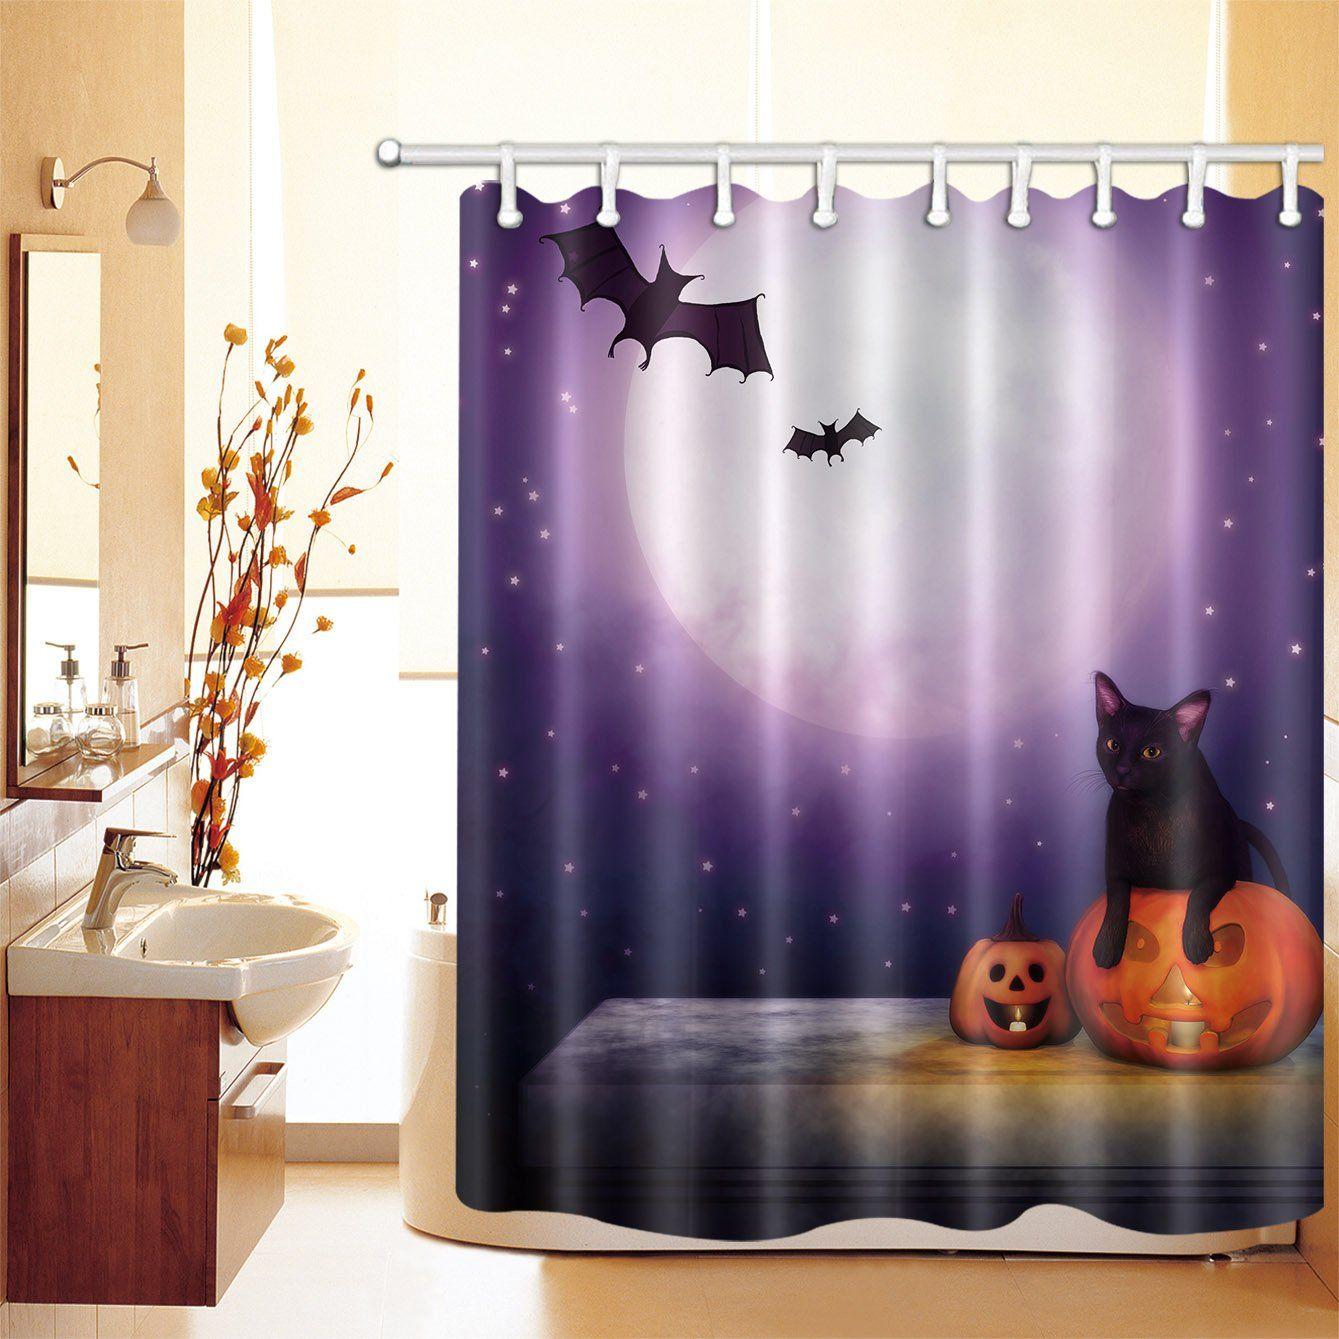 Lb Black Cat Bat Pumpkin Scary Night Shower Curtain Set Spooky